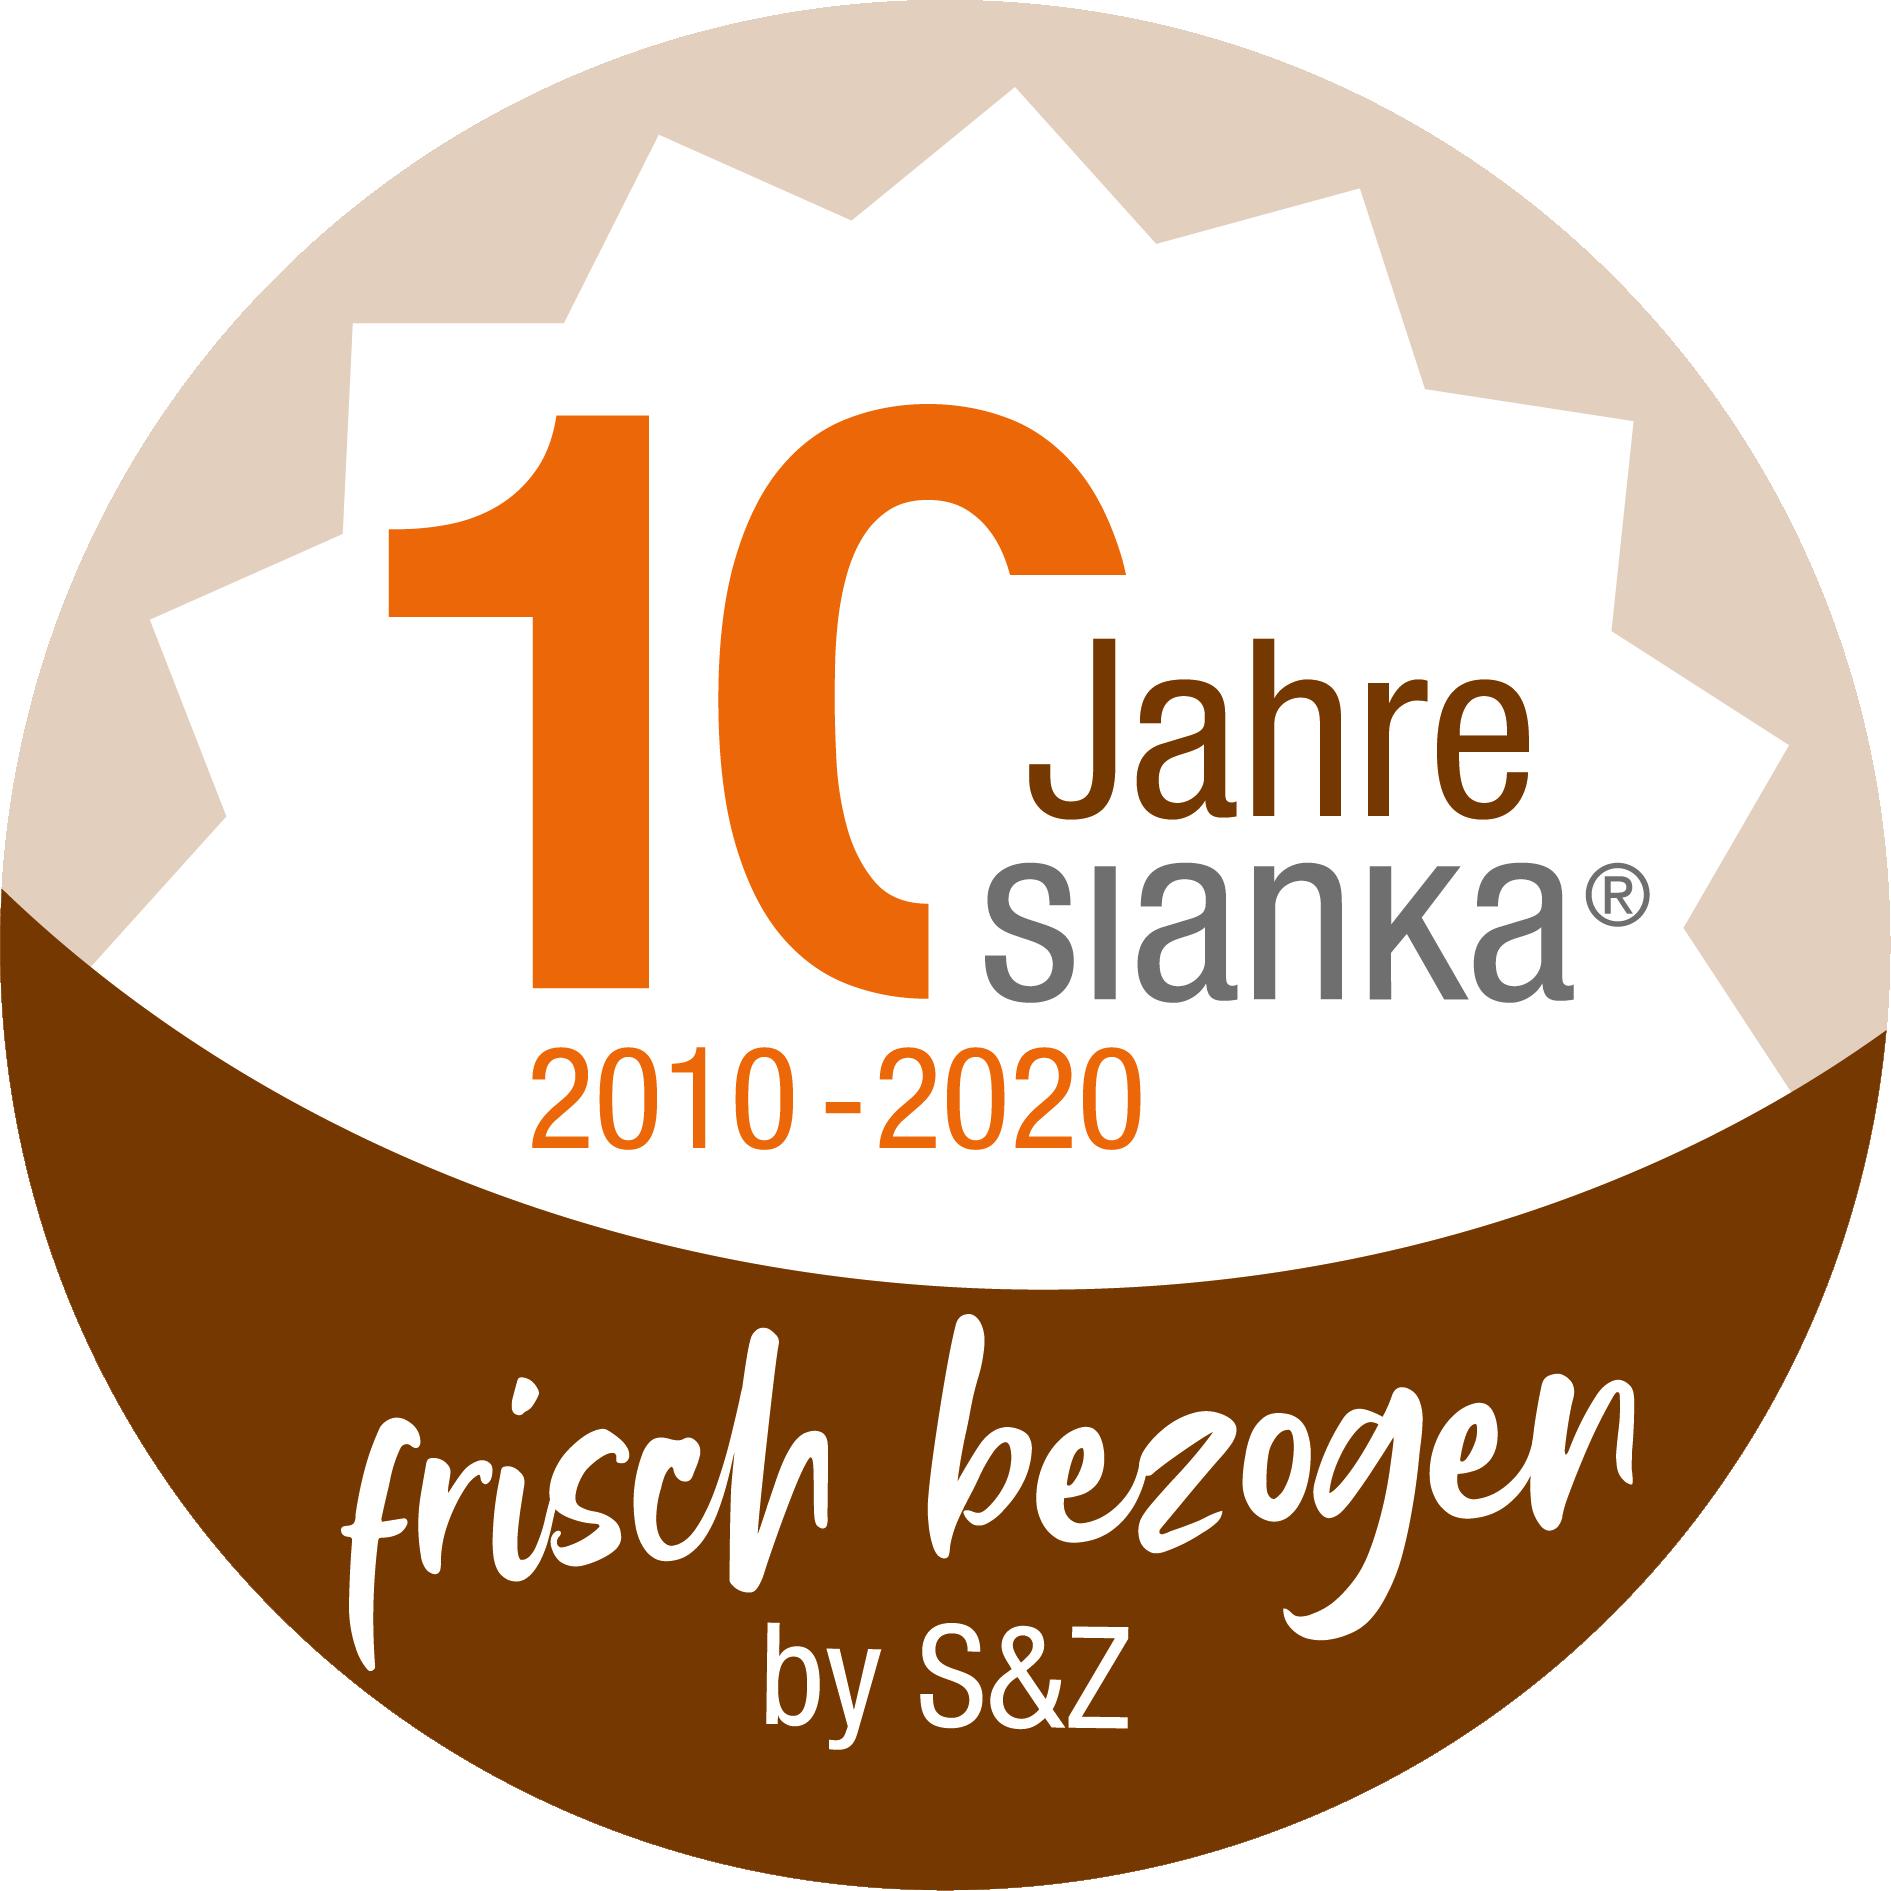 Jubilaeumssignet_sianka-1